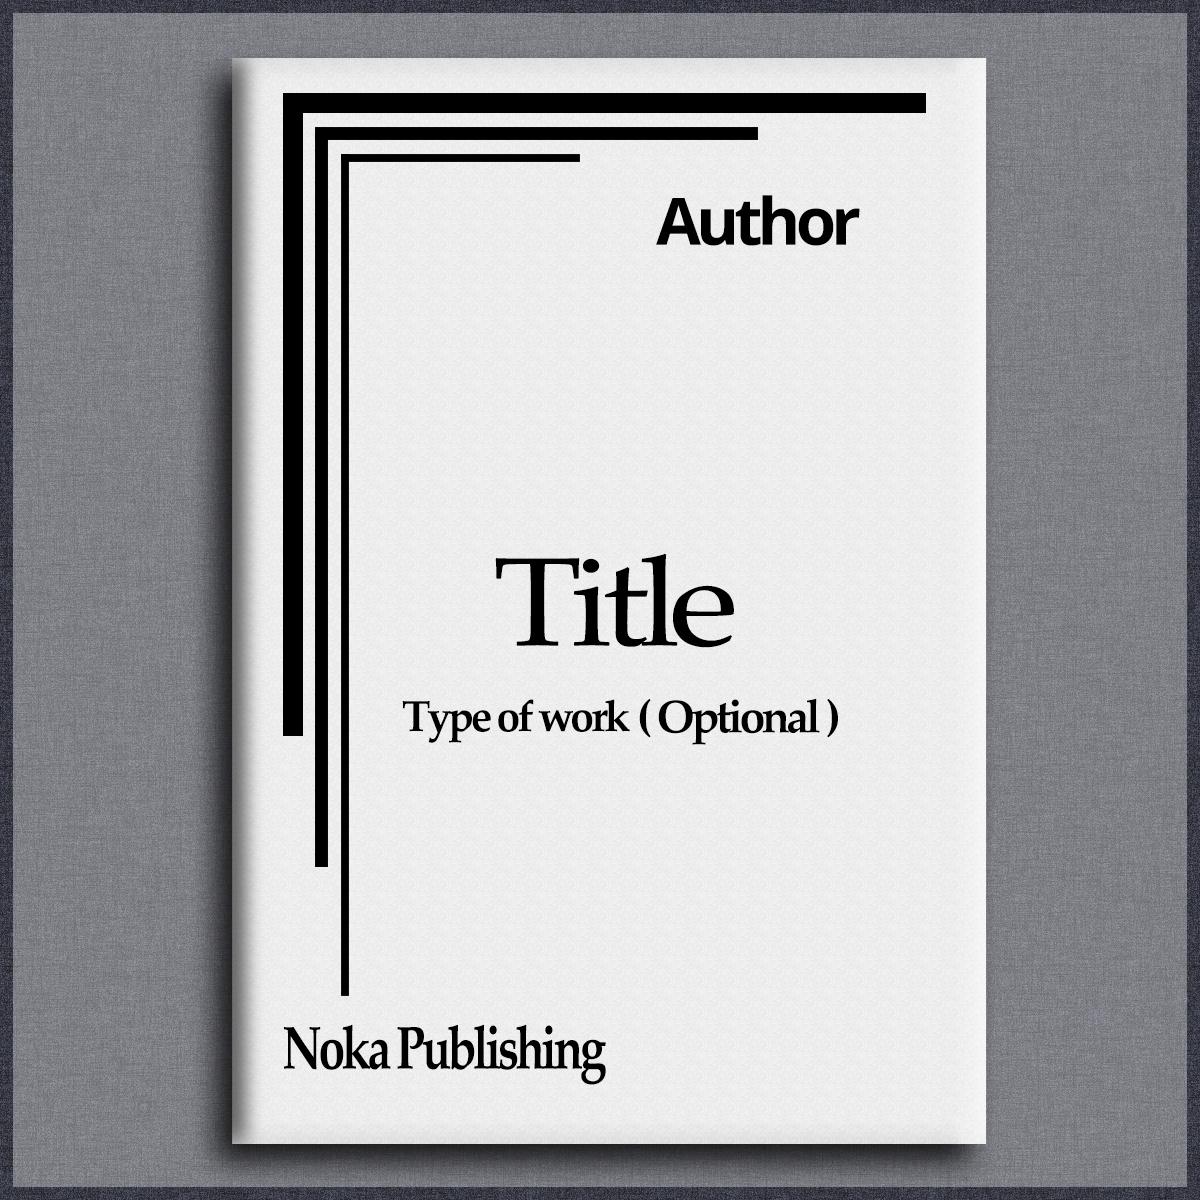 Black Book Cover Design : Conservative serious non profit book cover design for a